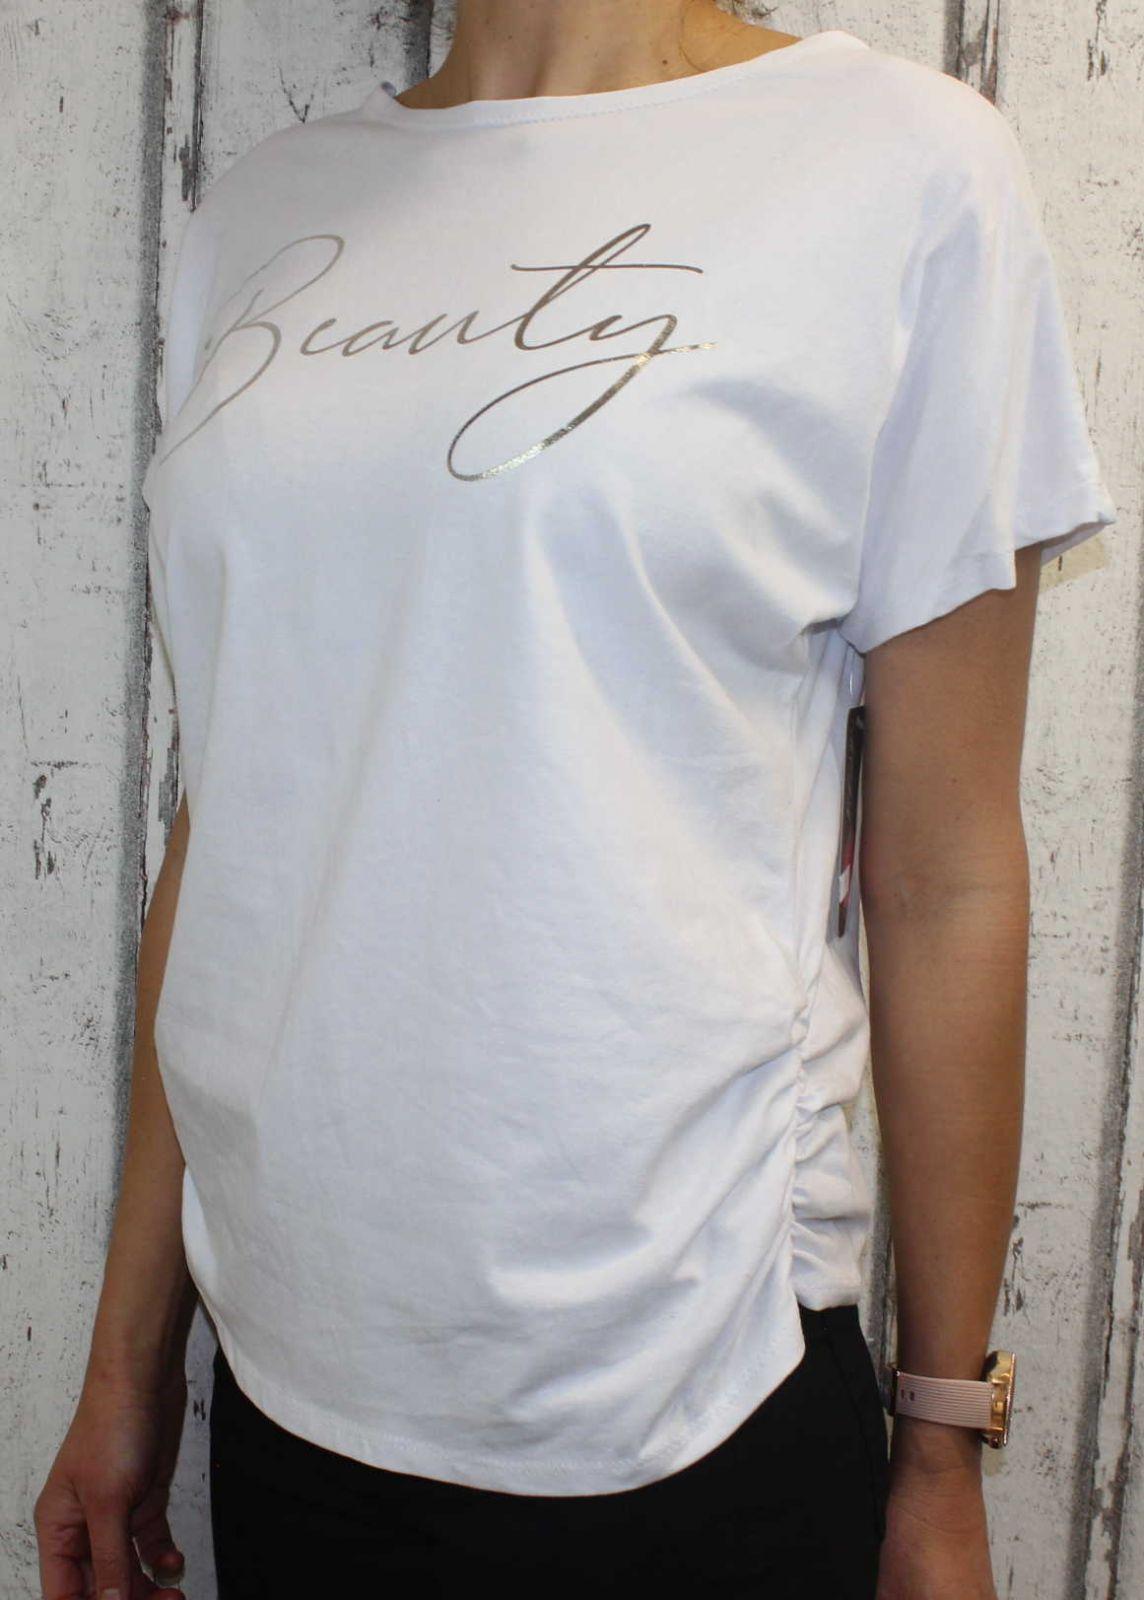 Dámské tričko krátký rukáv, tričko spadlá ramena, dámské volné triko, pohodlné dámské tričko, dámská tunika, volné tričko přes břicho, tričko s rantlem, bílé volné tričko s nařasením na bocích Italy Moda